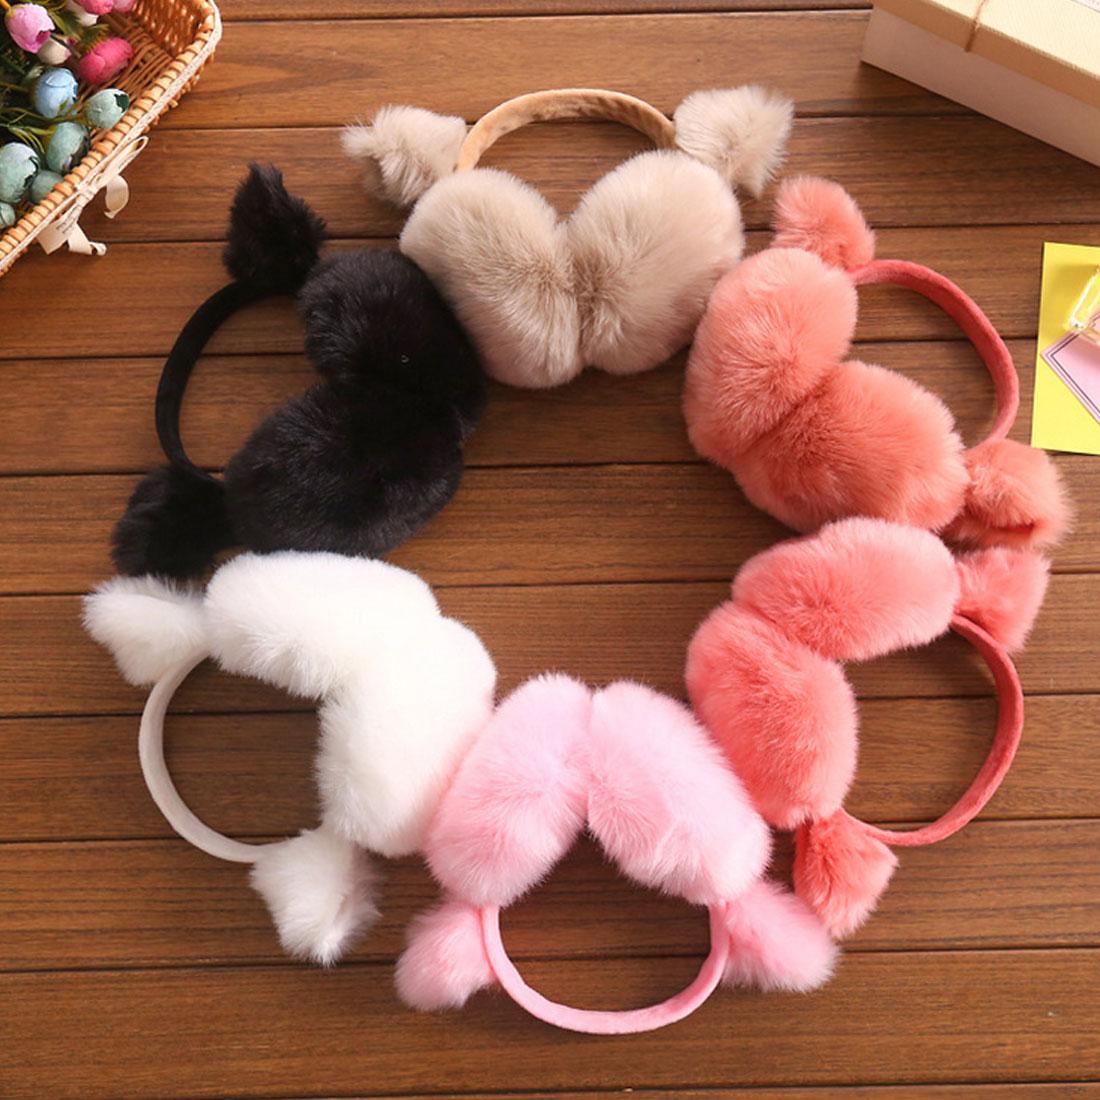 2017 New Fashion Rabbit Winter Earmuffs For Women Warm Fur Earmuffs Winter Warm Ear Warmers Gifts For Girls Female